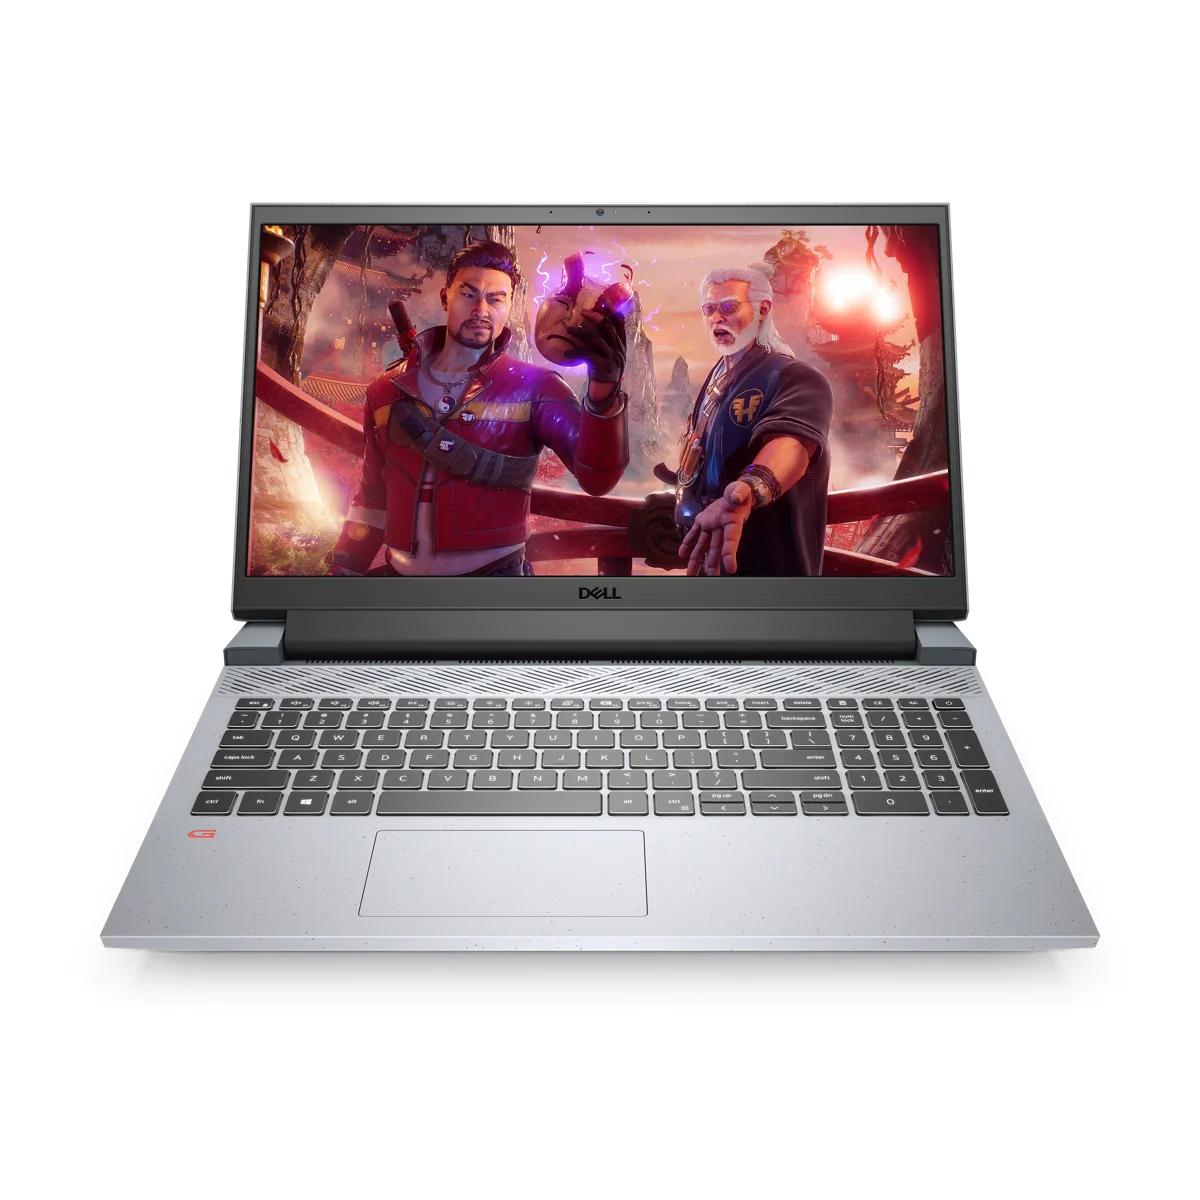 Dell G15 gaming laptop, Ryzen 5800H, 16GB ram, Nvidia RTX 3050 TI 4 GB, 512 GB SDD